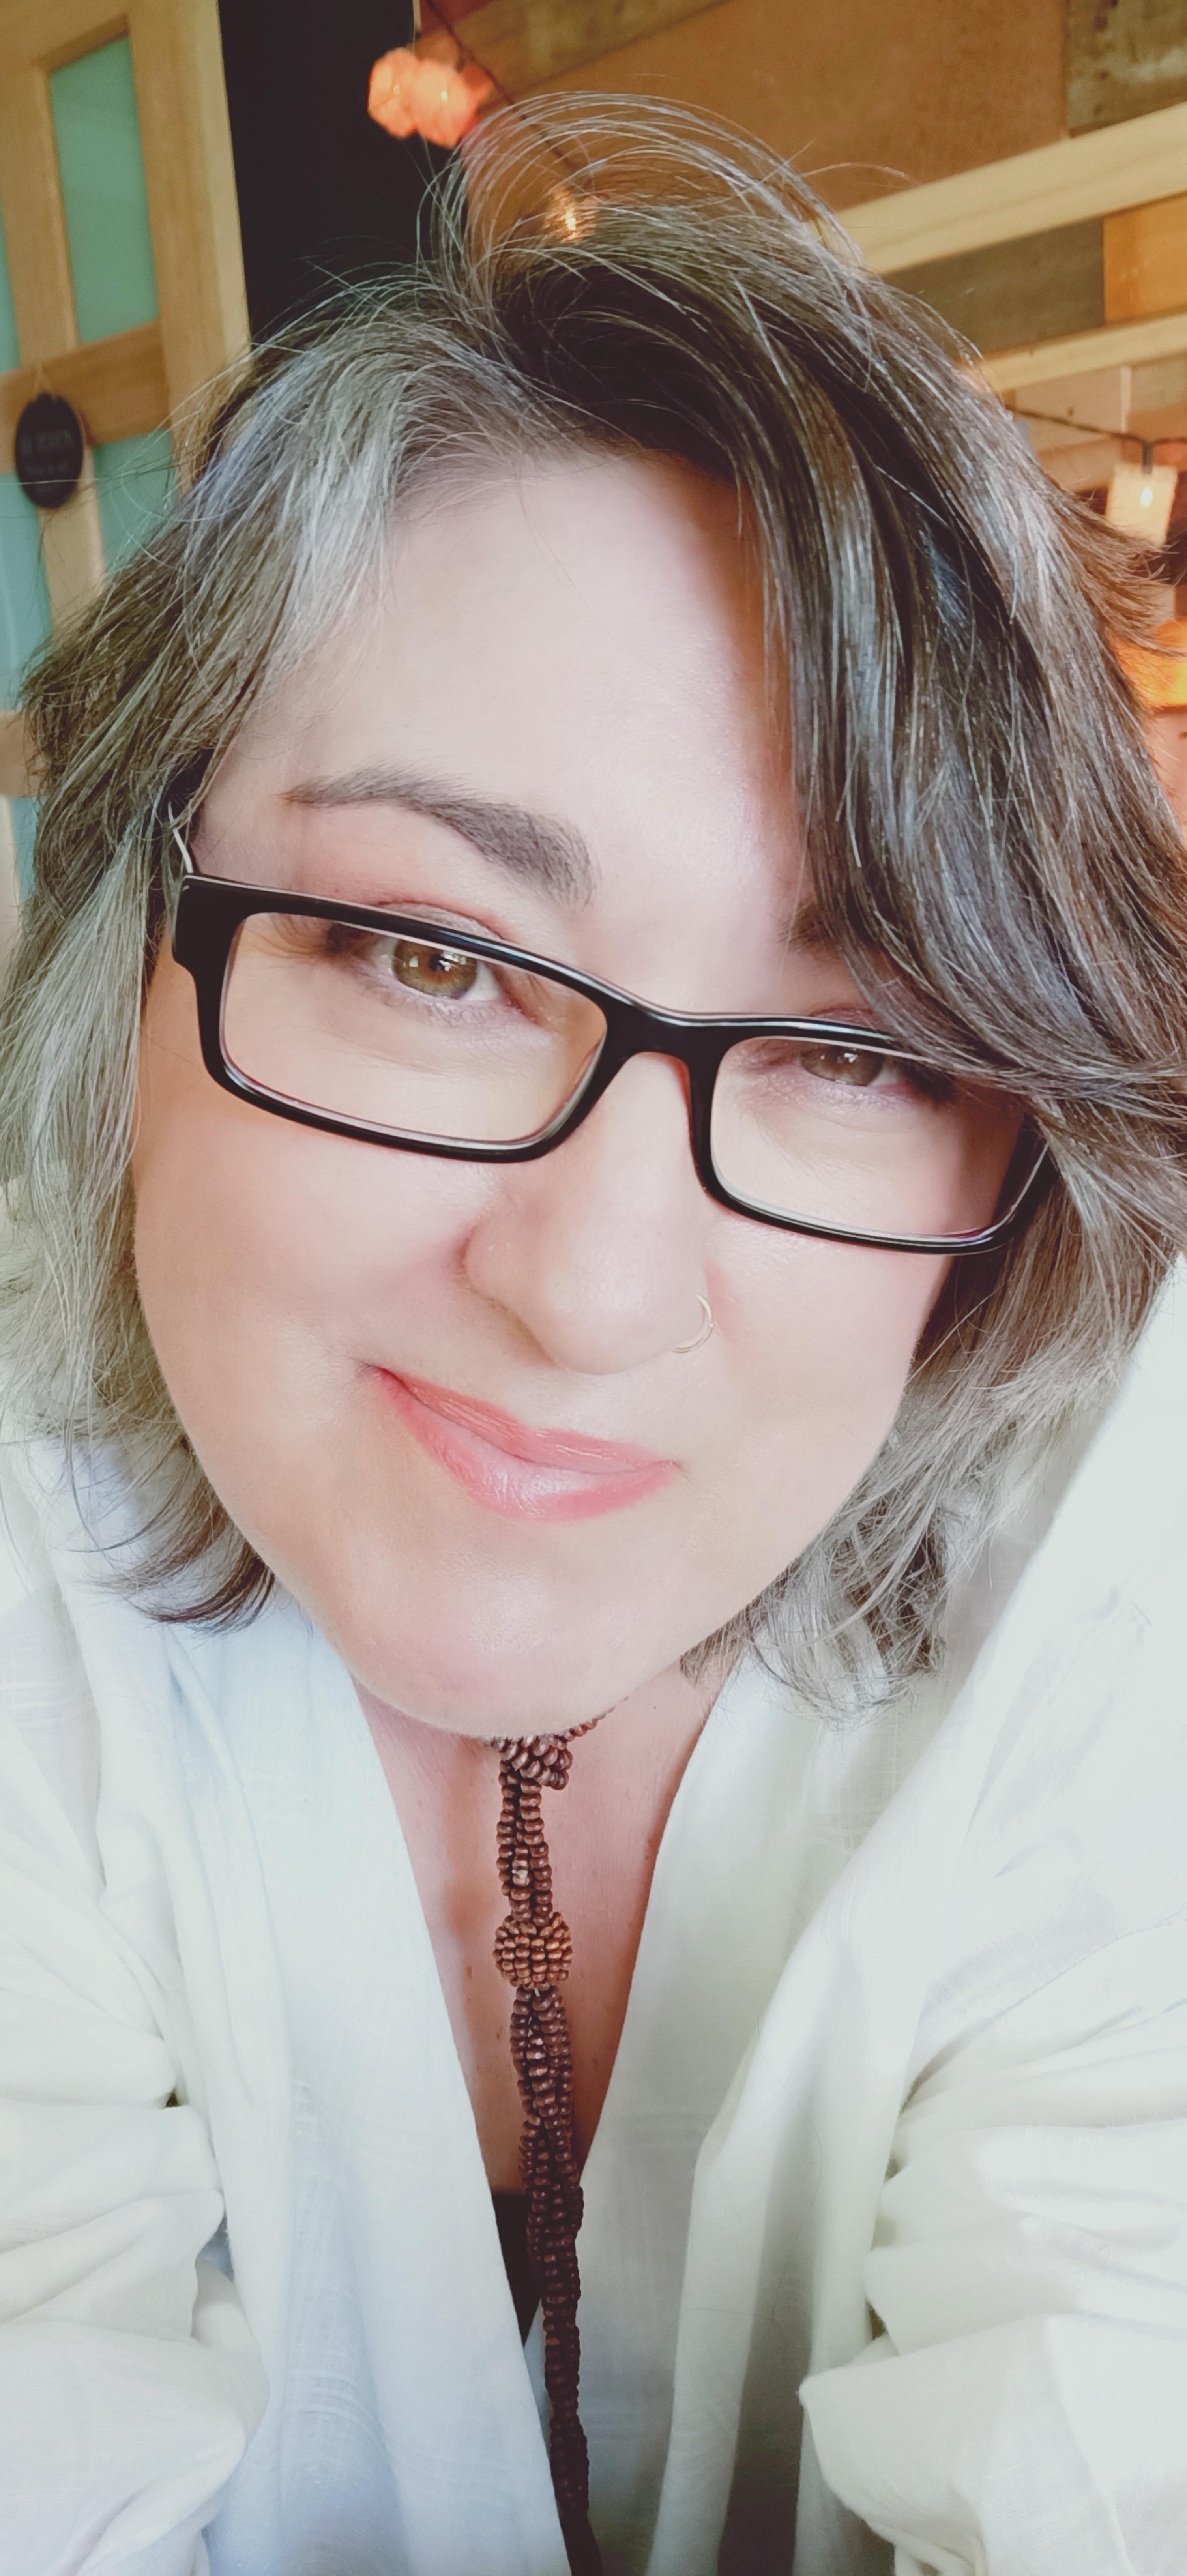 Tania Rose psychotherapist